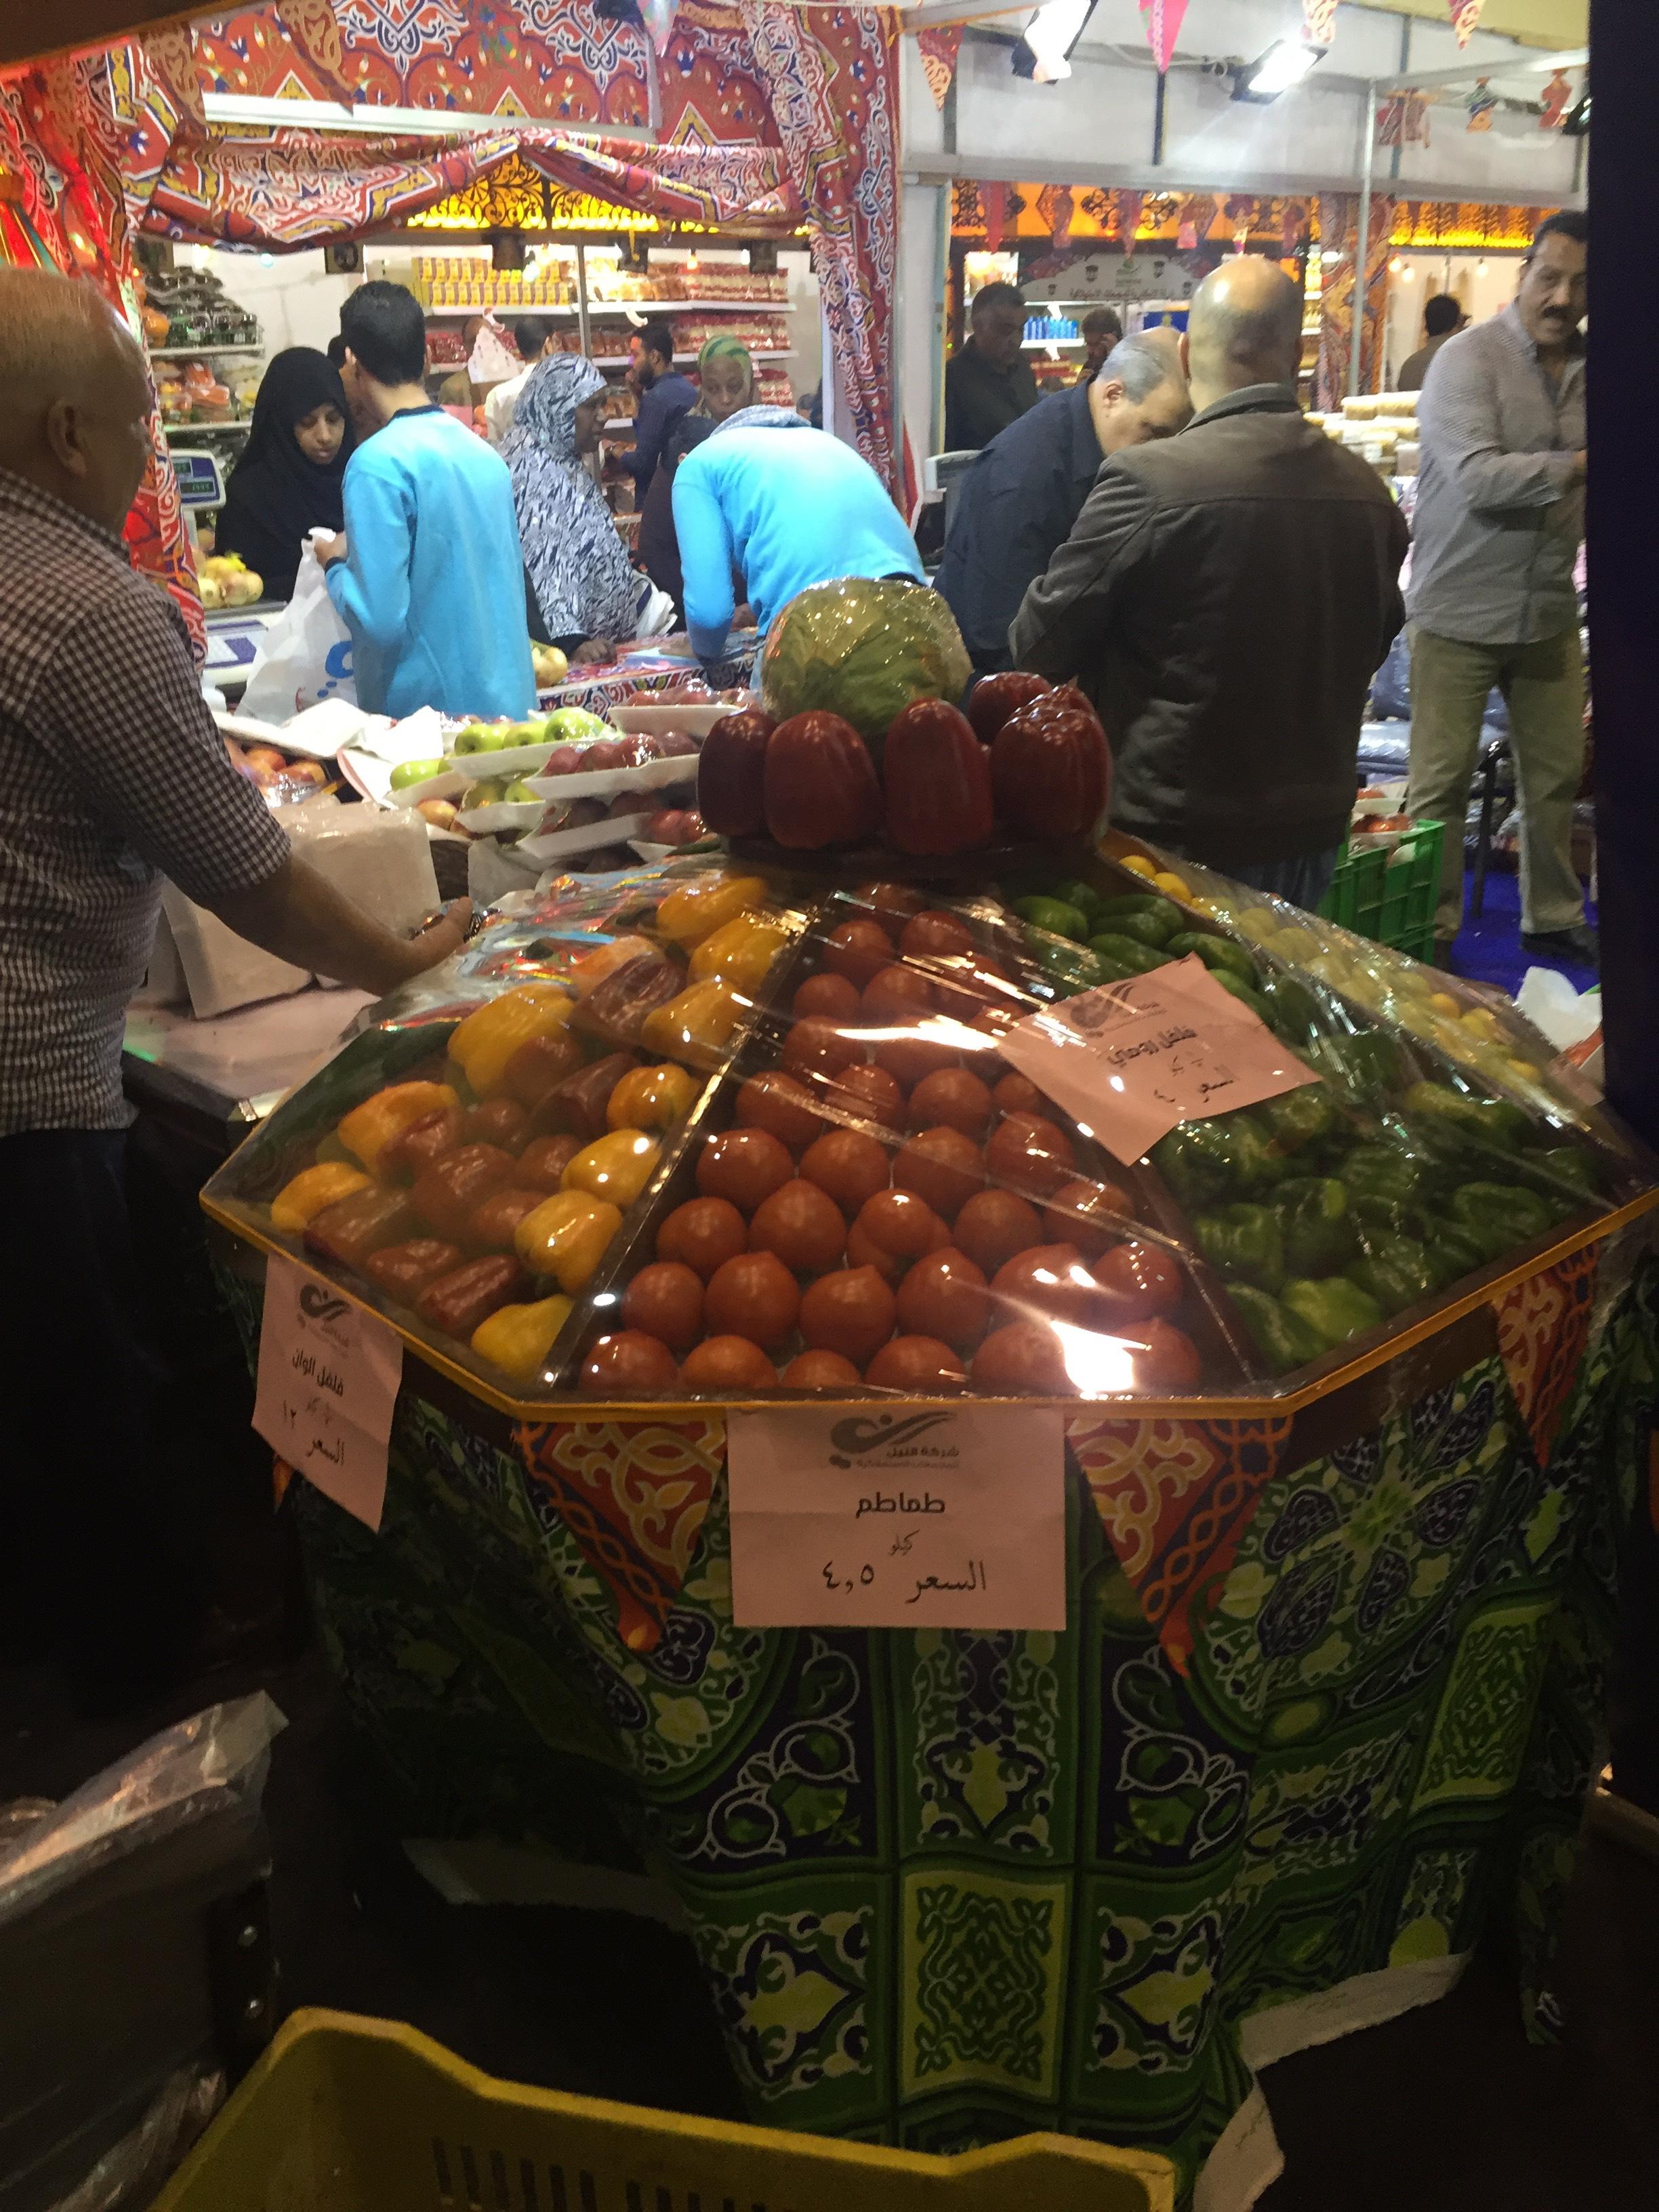 معرض سوبر ماركت أهلا رمضان (4)